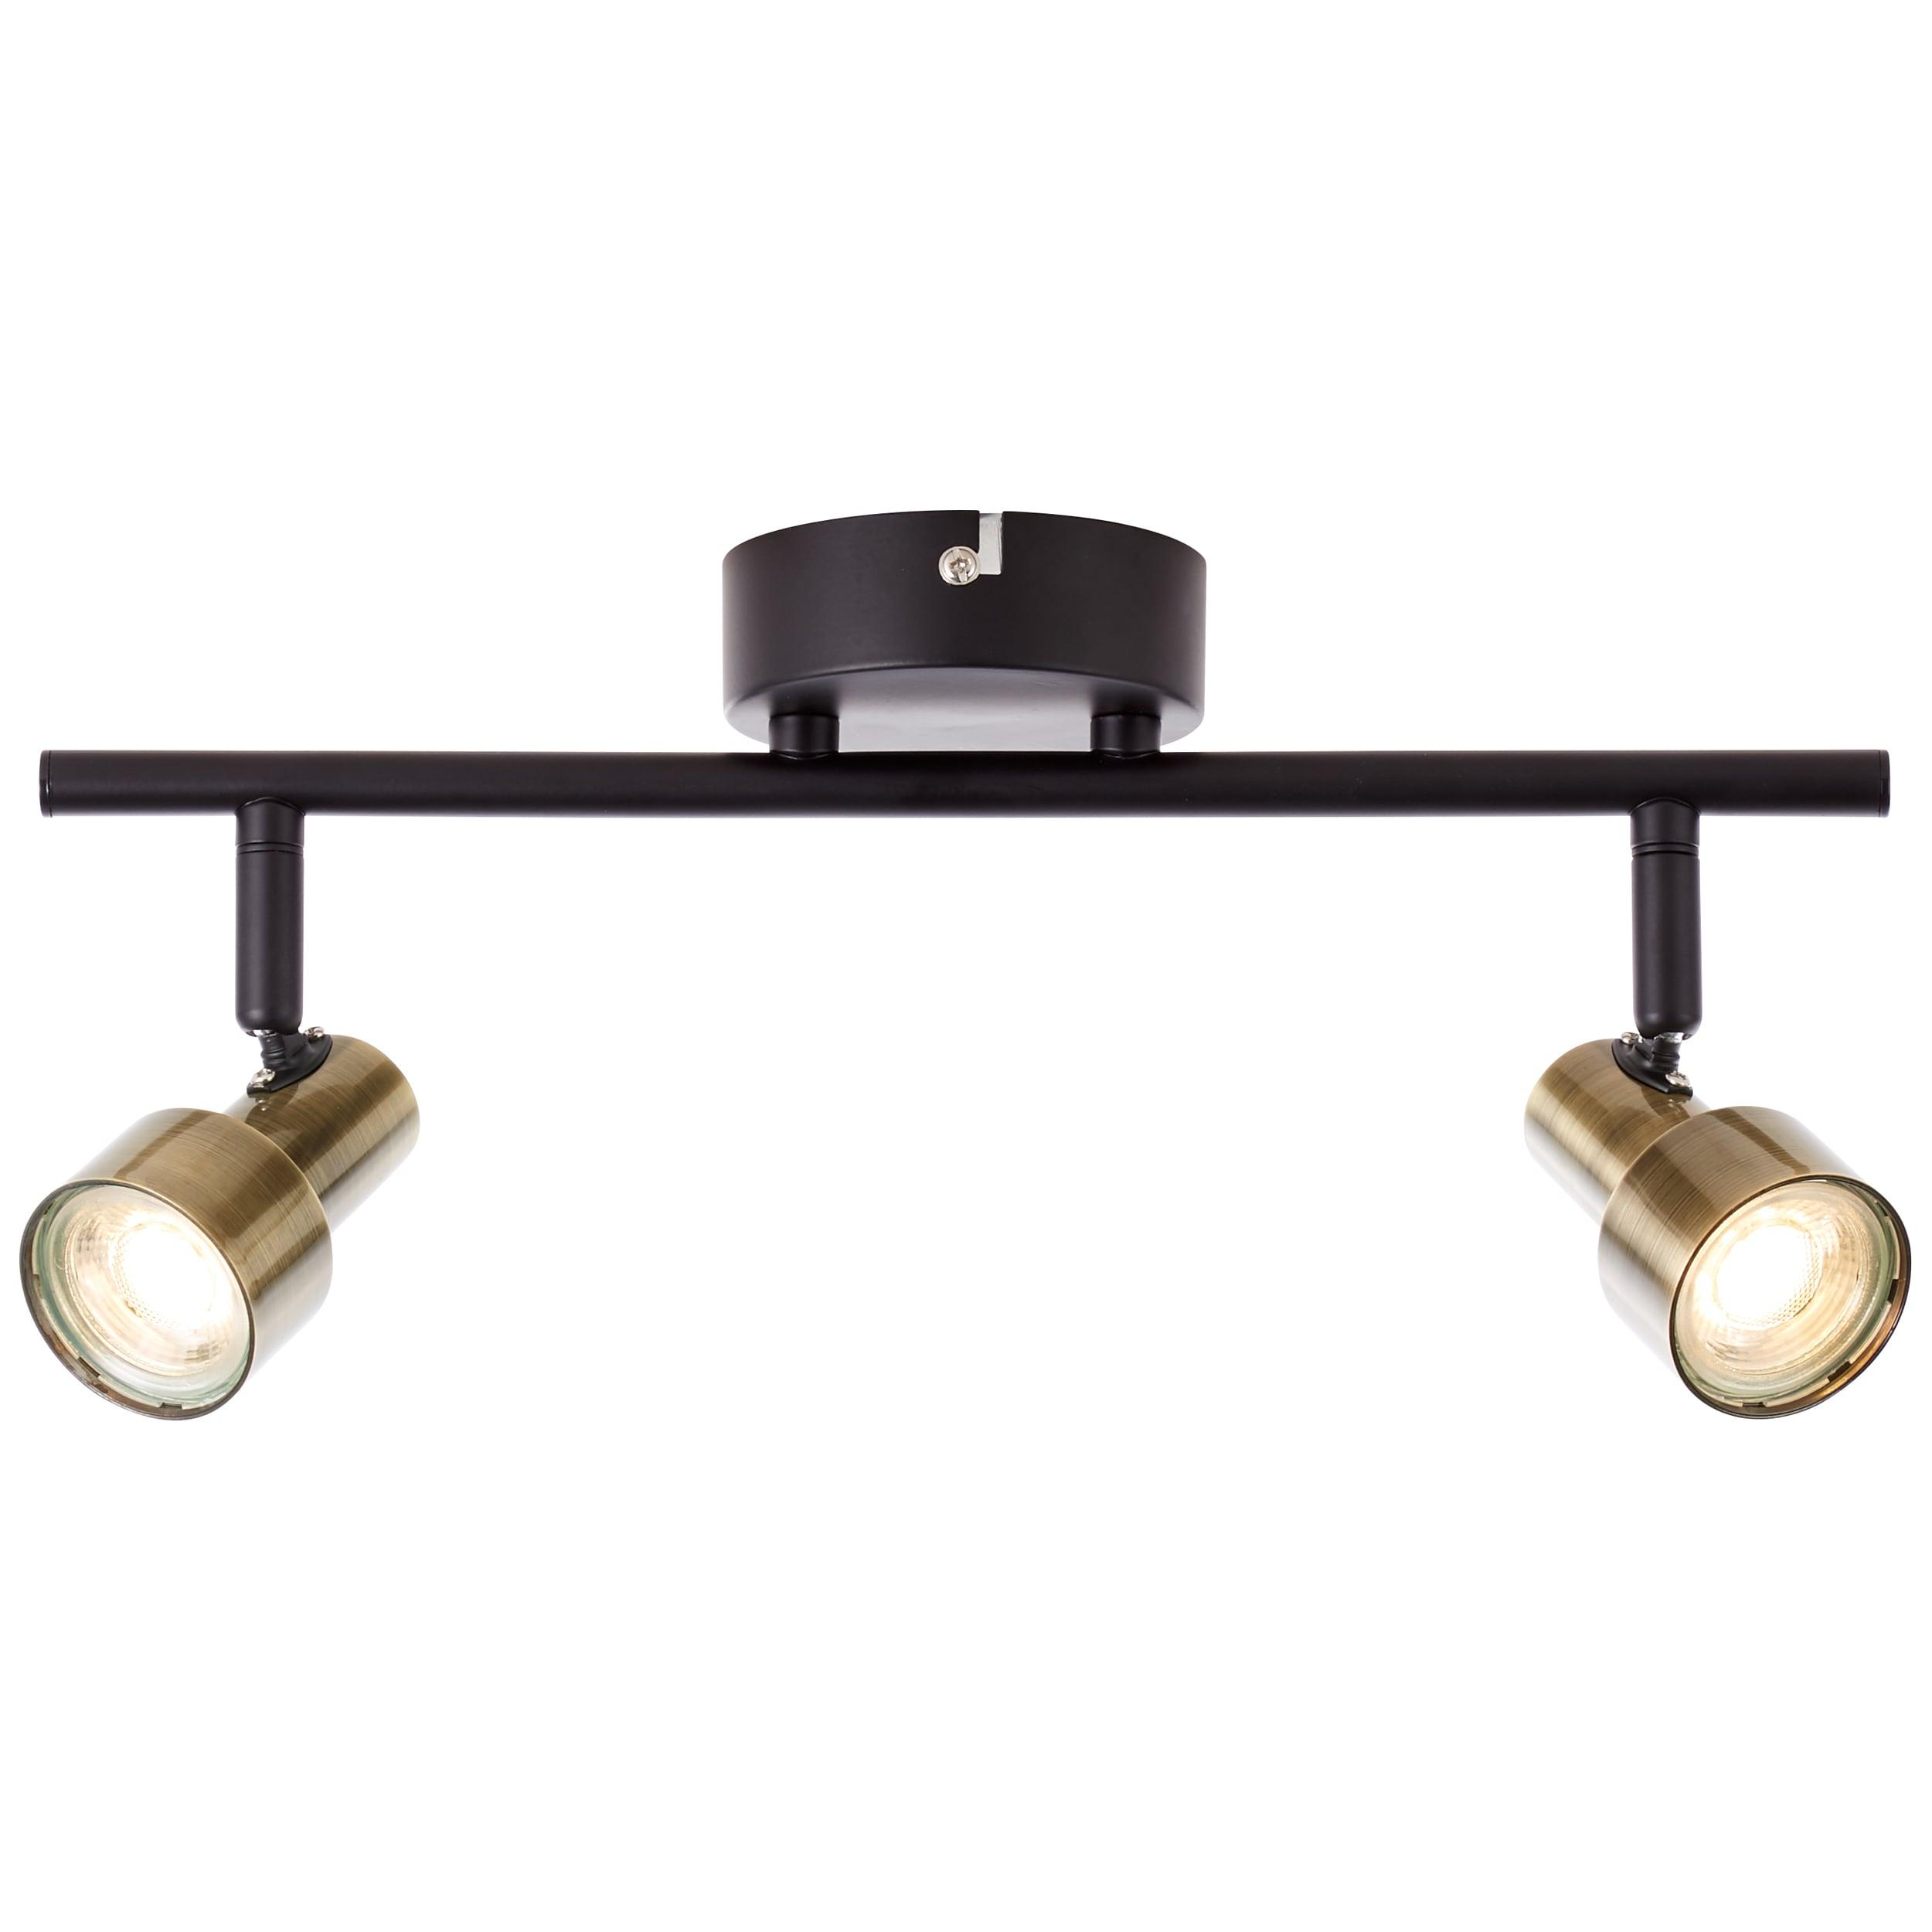 Brilliant Leuchten Croyden LED Spotrohr 2flg messing/schwarz